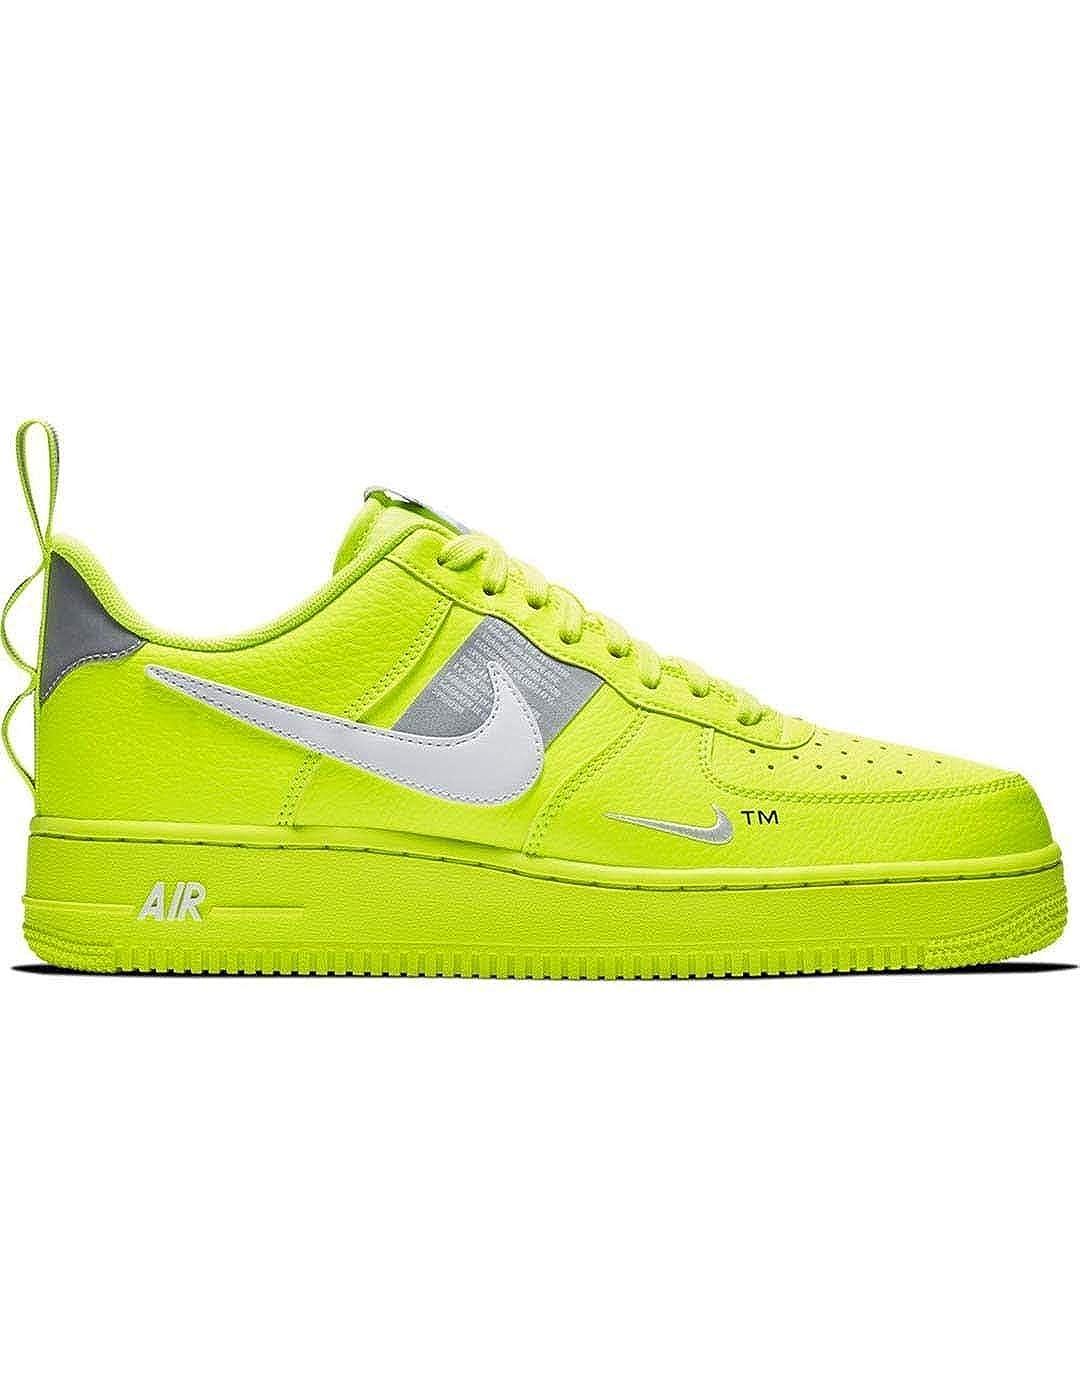 Nike Air Force 1 07 Lv8 Utility Aj7747 700 Amazon Co Uk Shoes